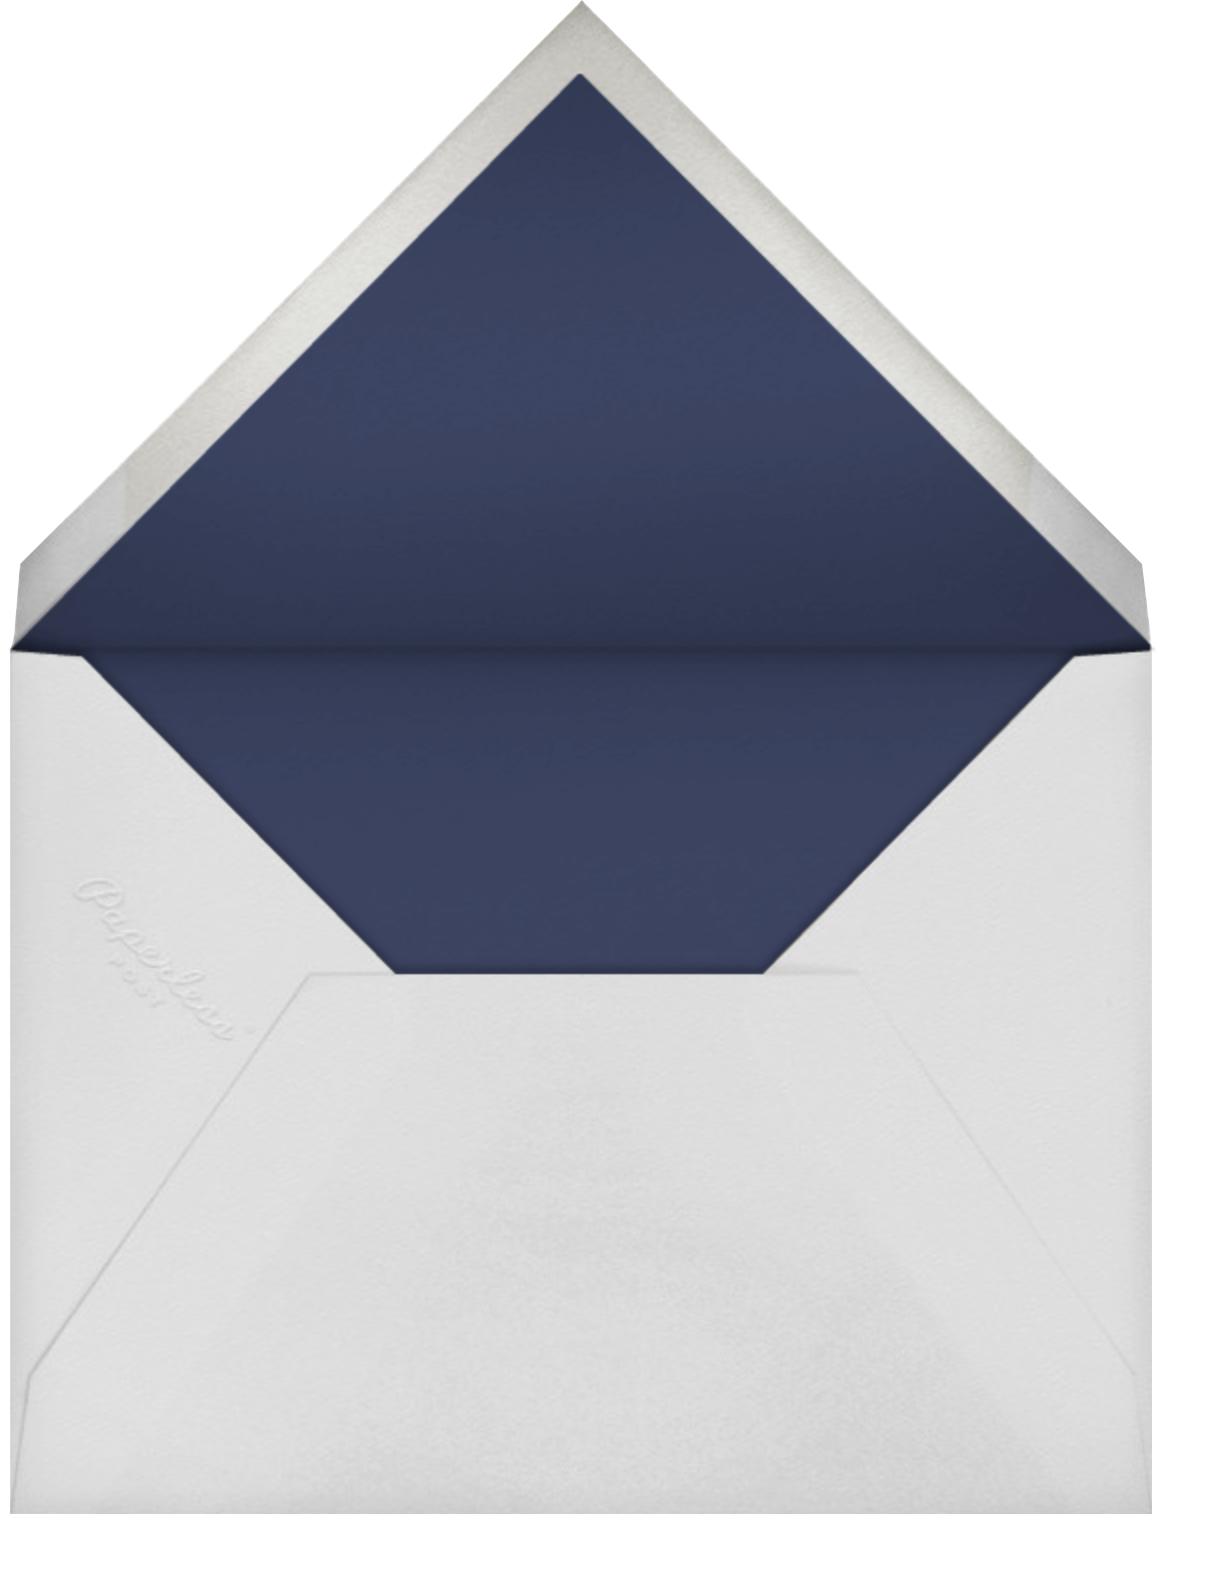 Miss Cricket (Save the Date) - Navy - Mr. Boddington's Studio - Save the date - envelope back